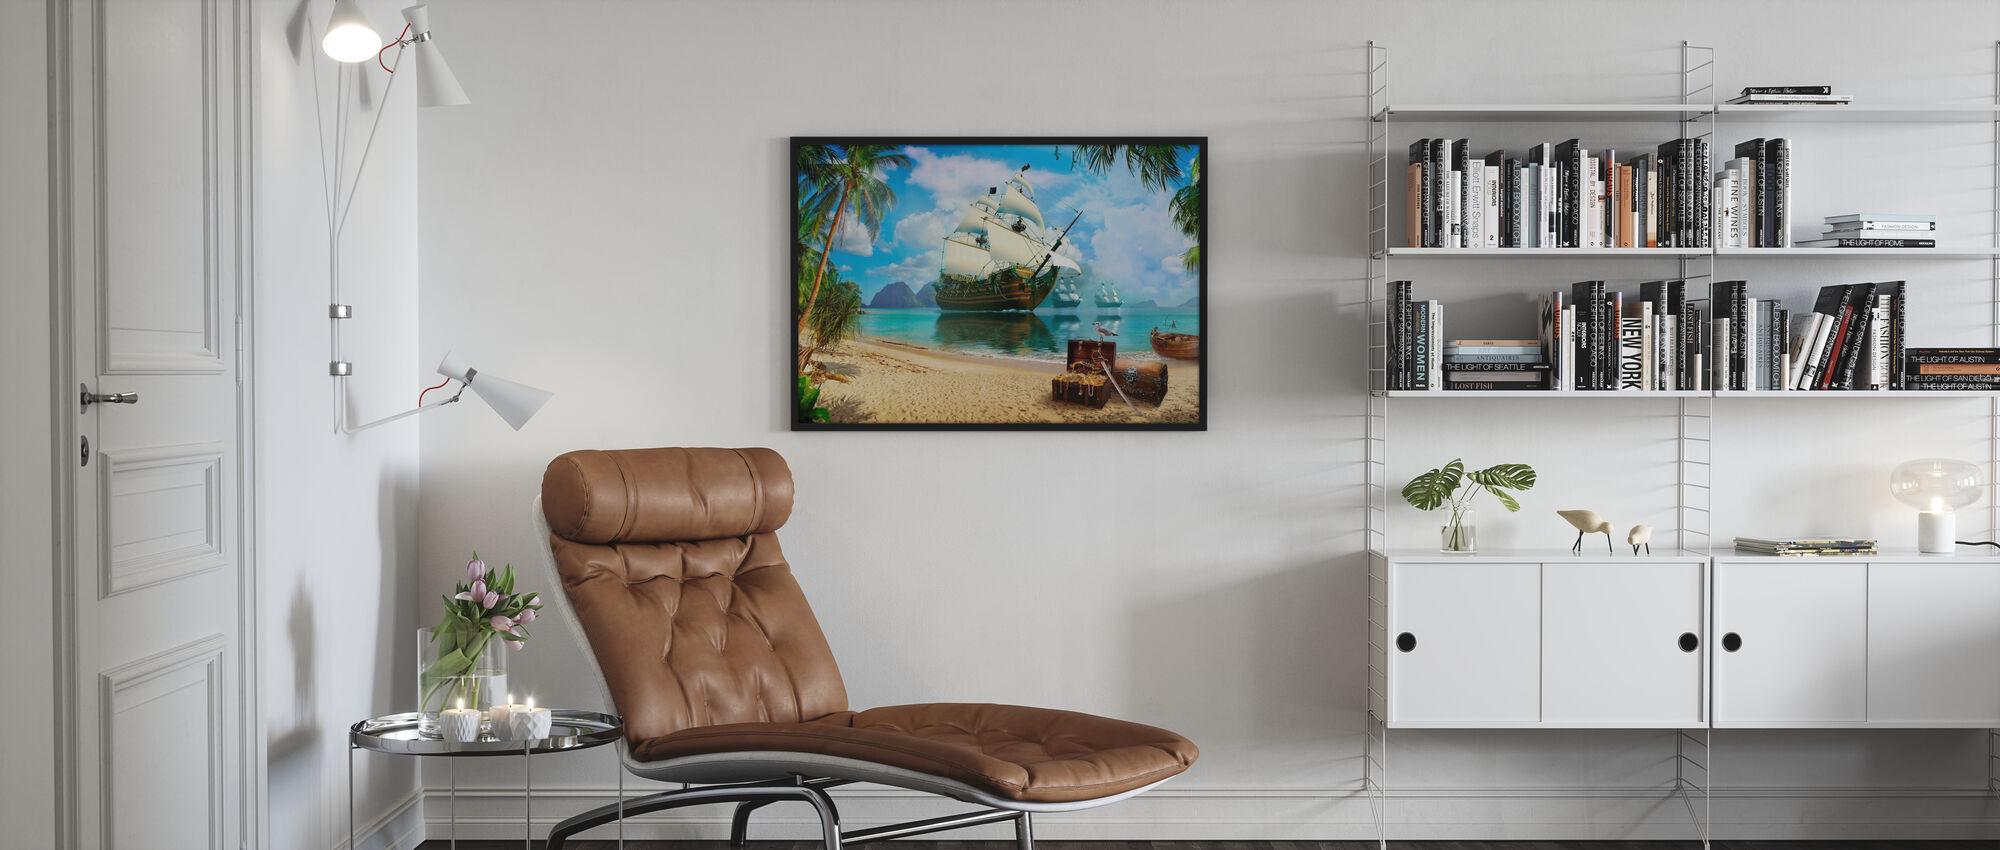 Pirate Treasure Island - Poster - Living Room